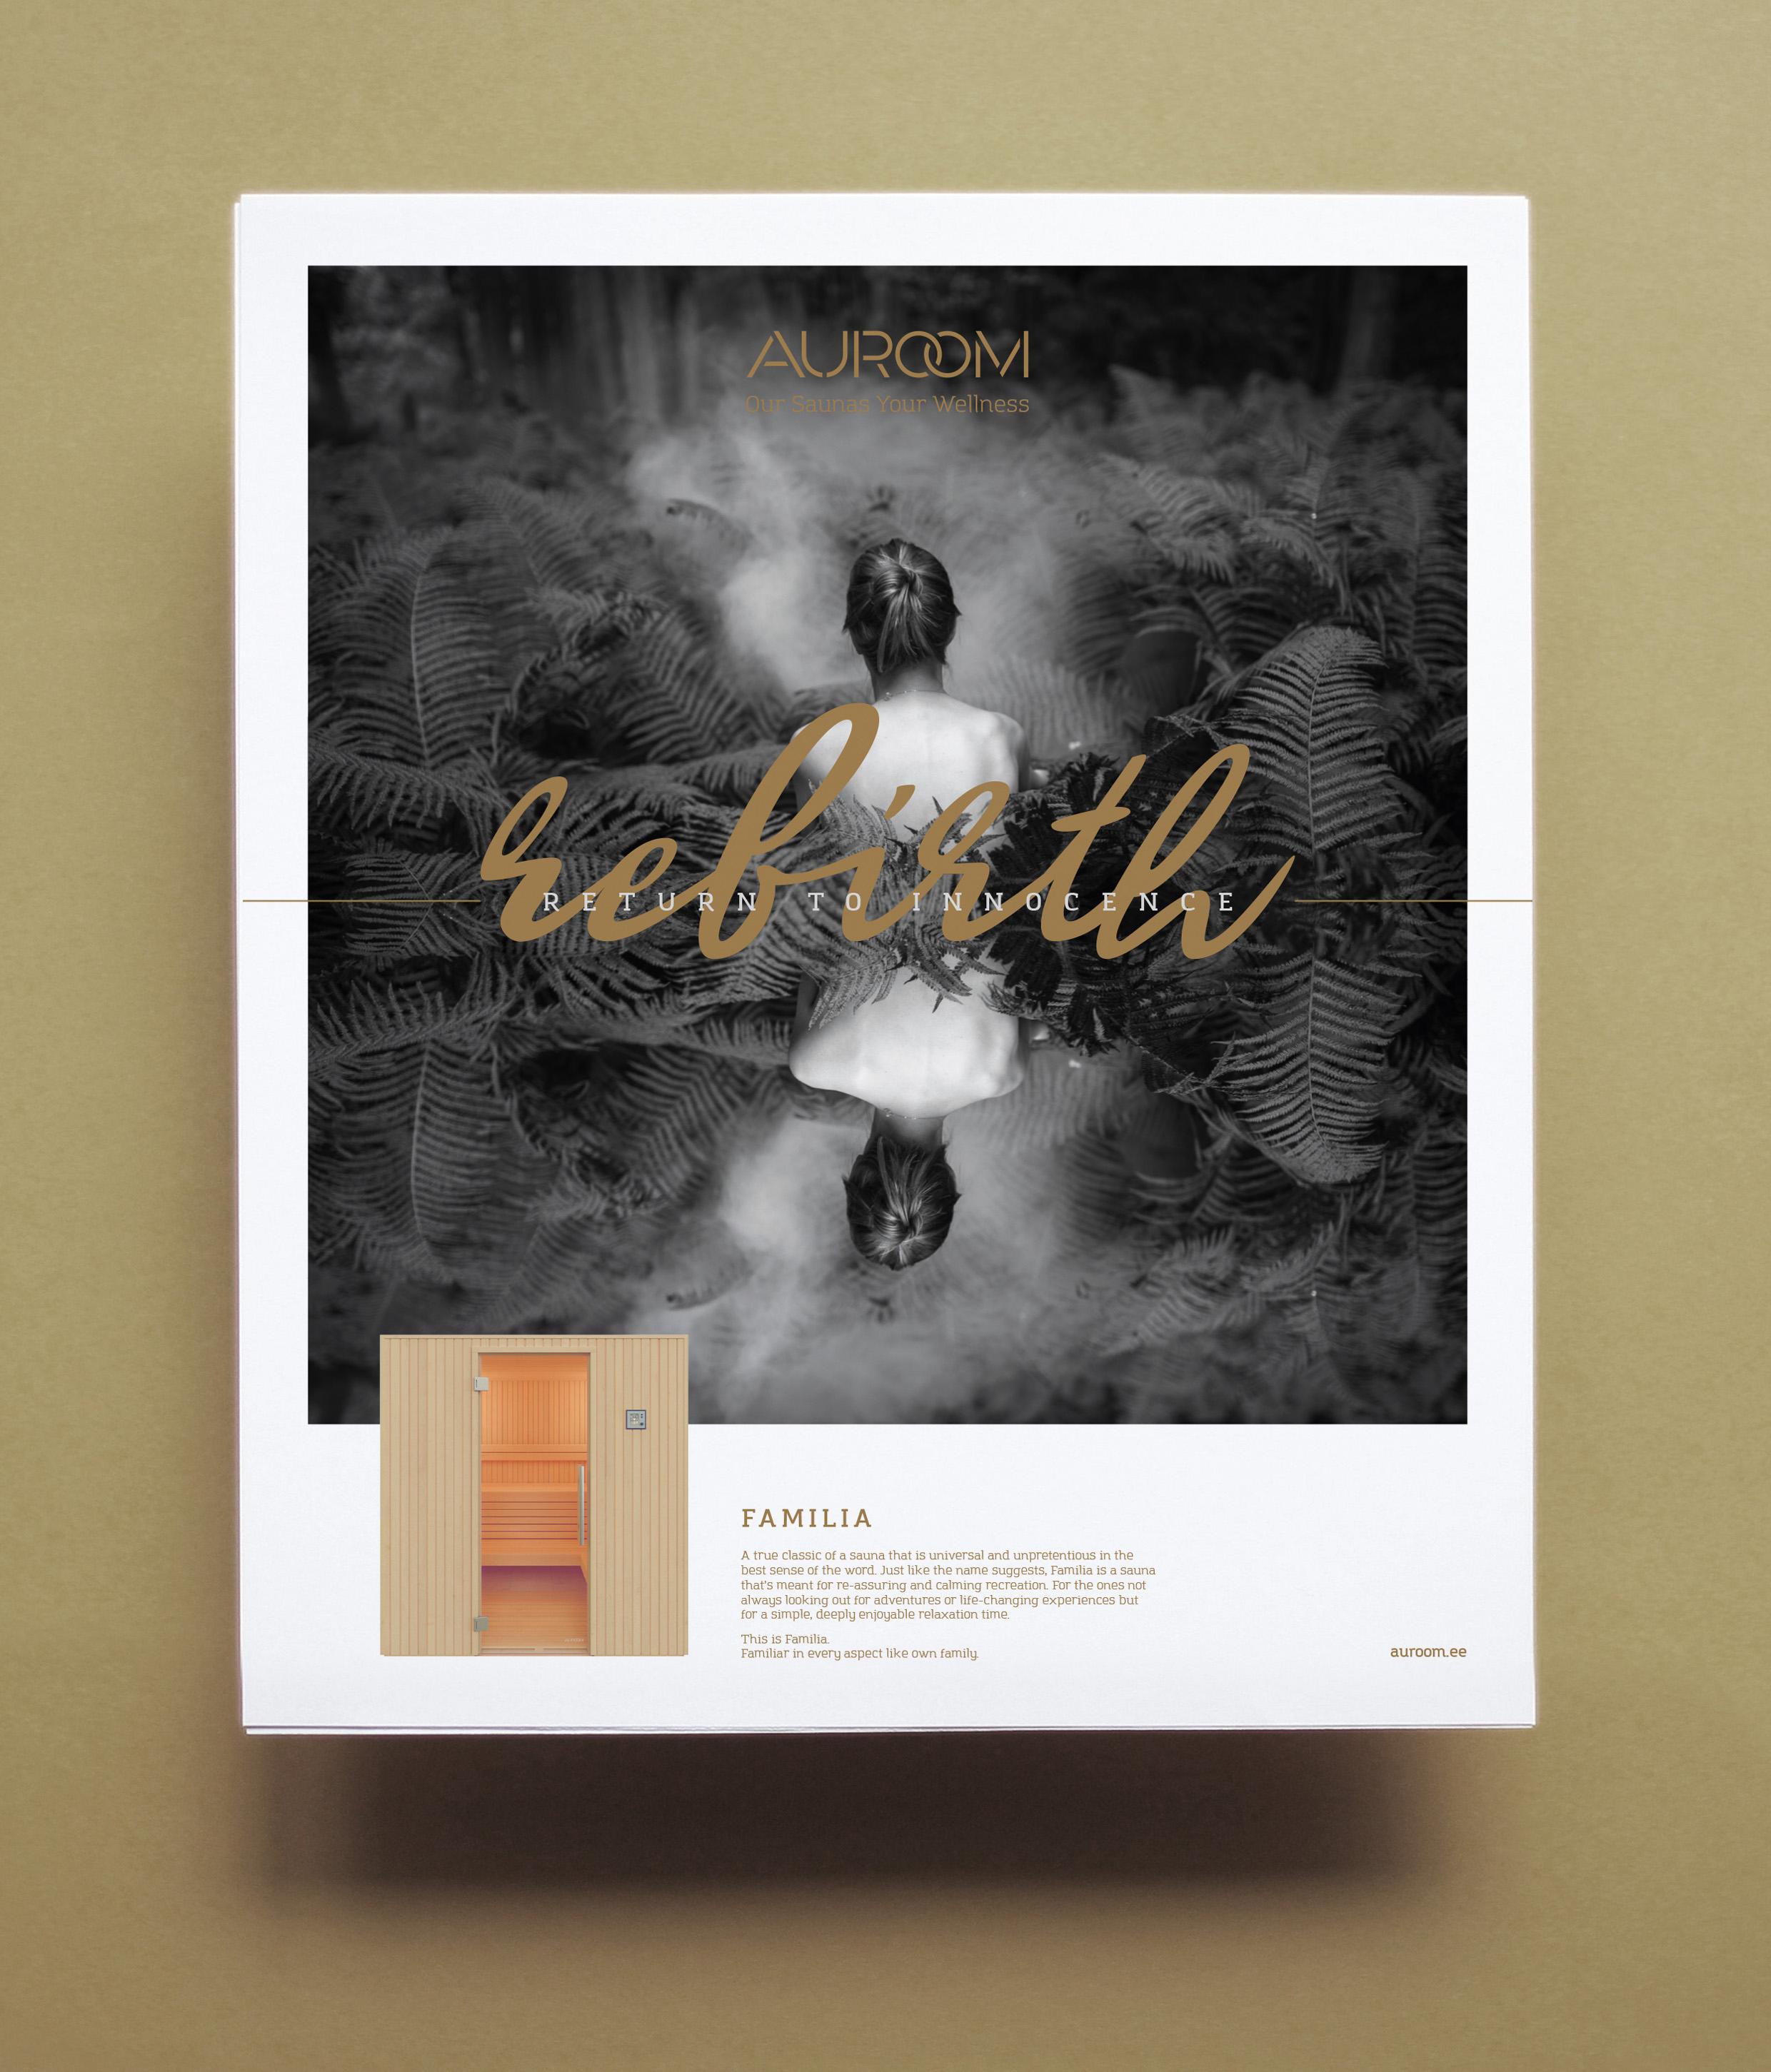 Auroom – Rebirth